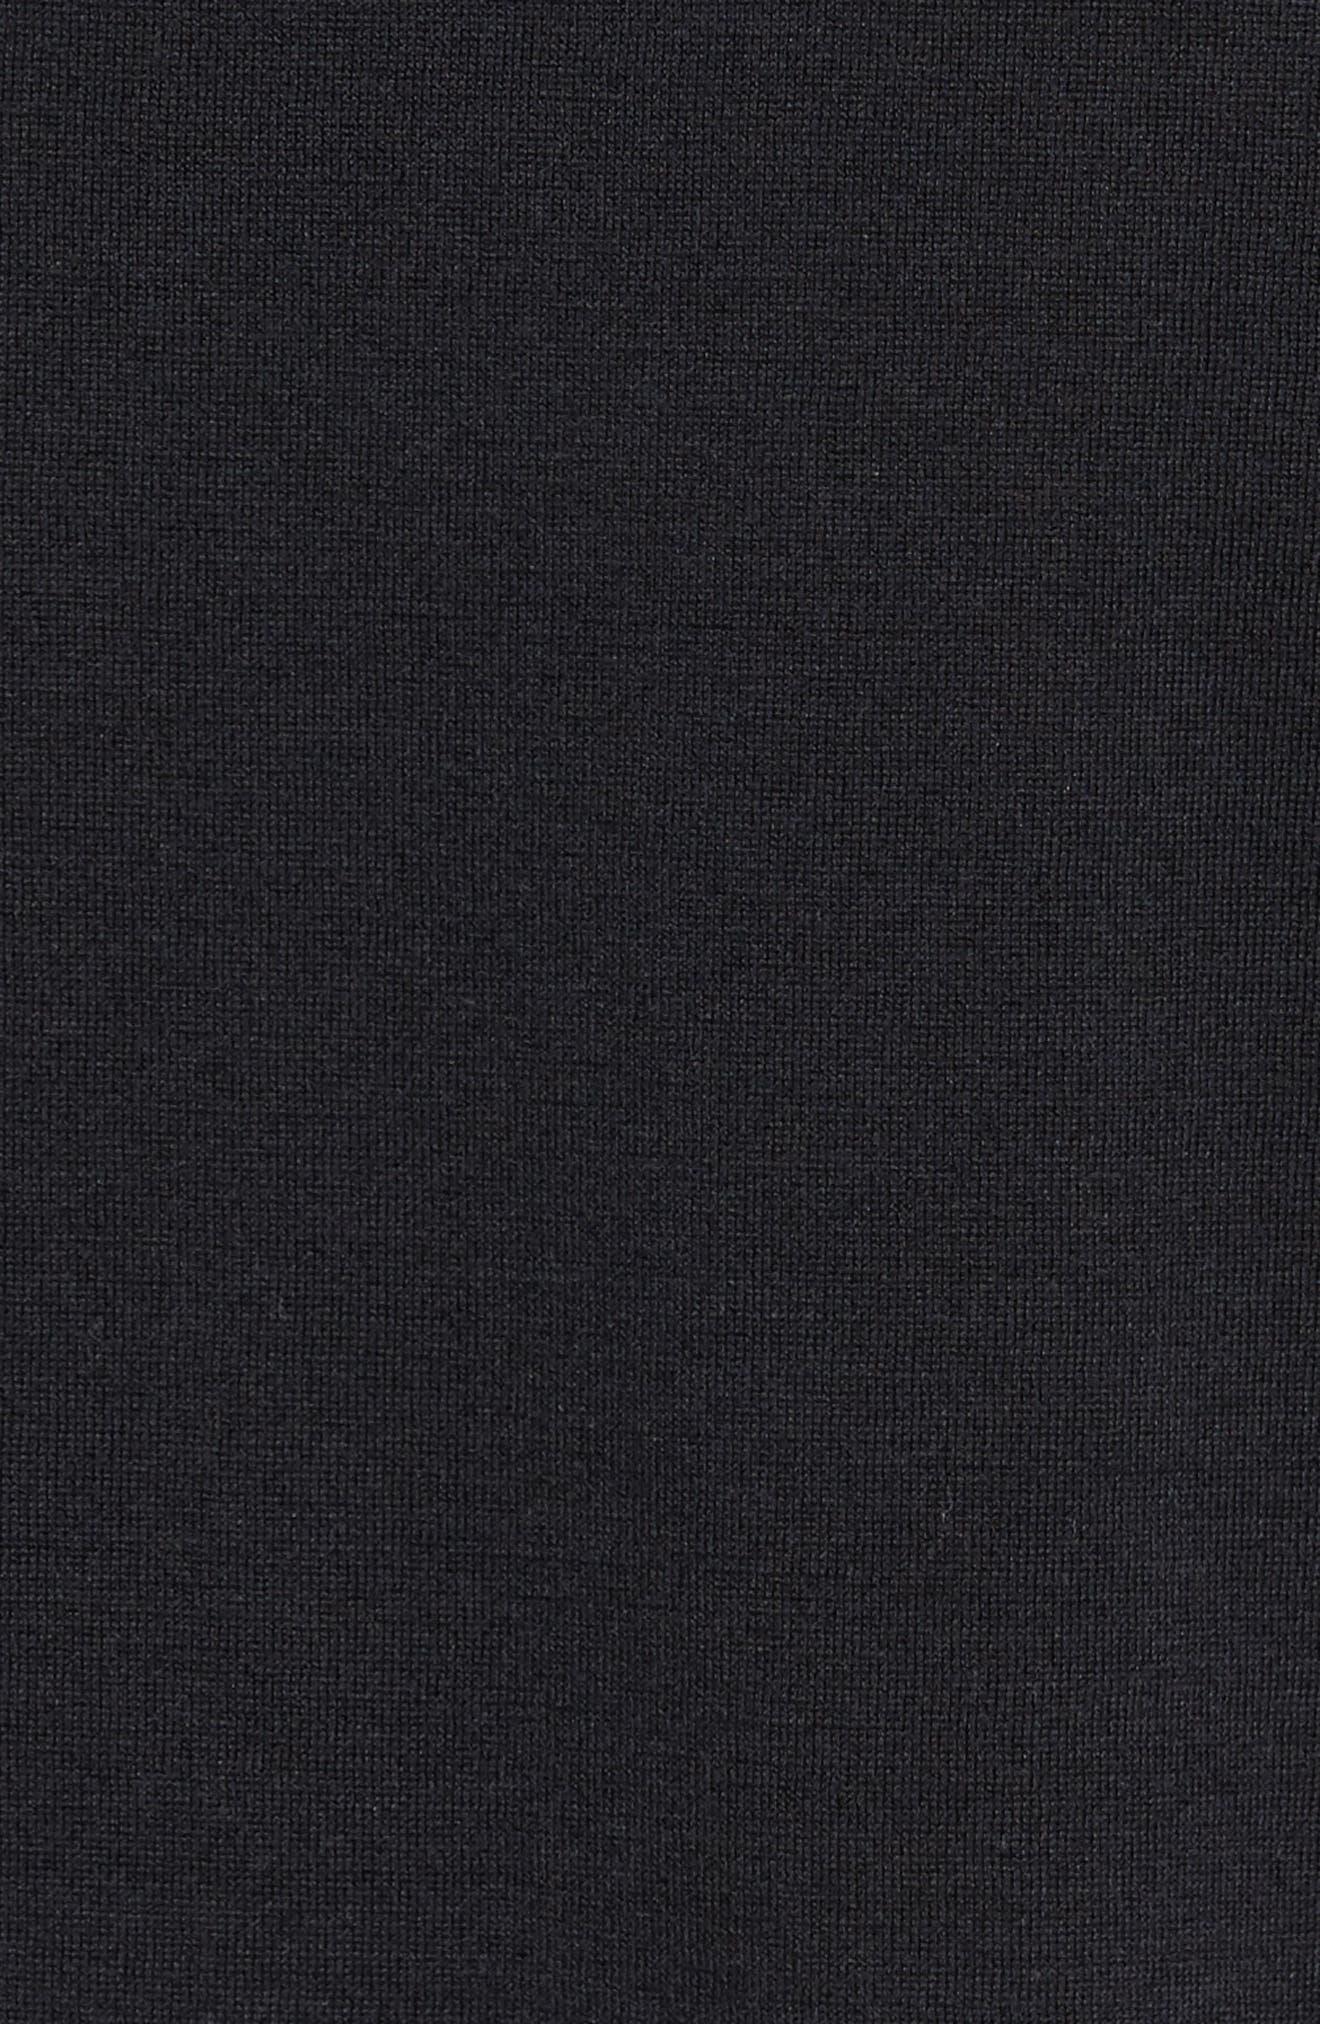 KJ Chalk Stripe Polo,                             Alternate thumbnail 5, color,                             001